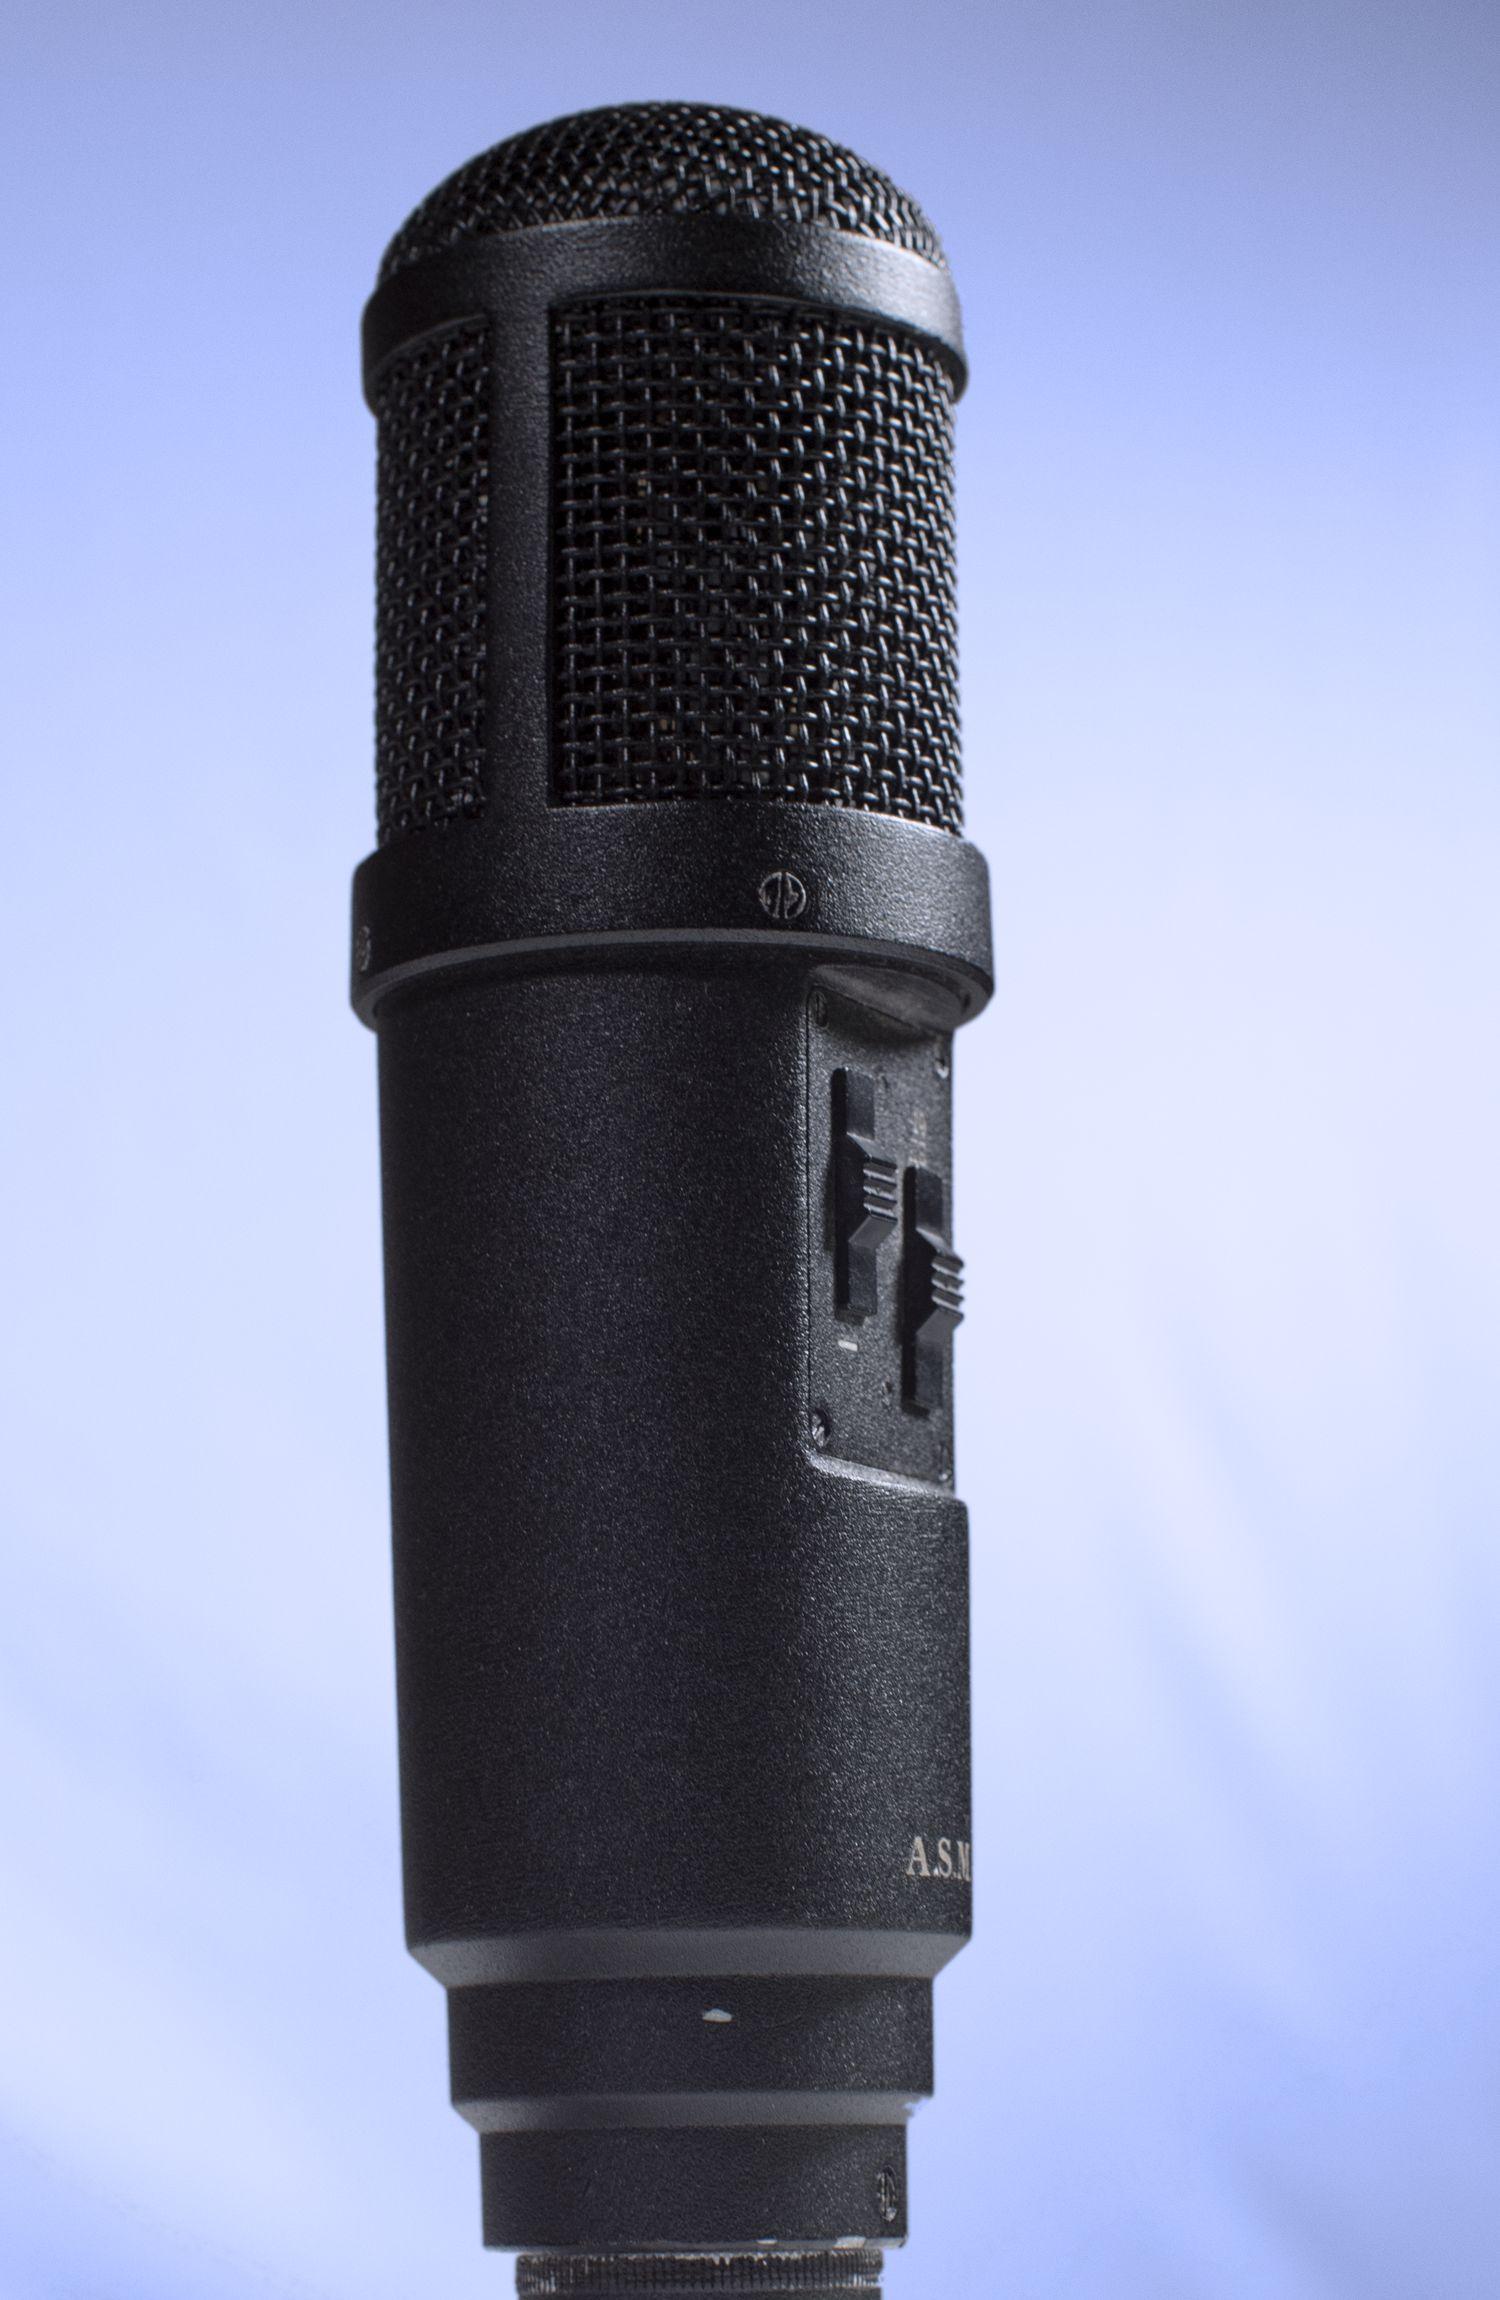 oktava-mic.jpg